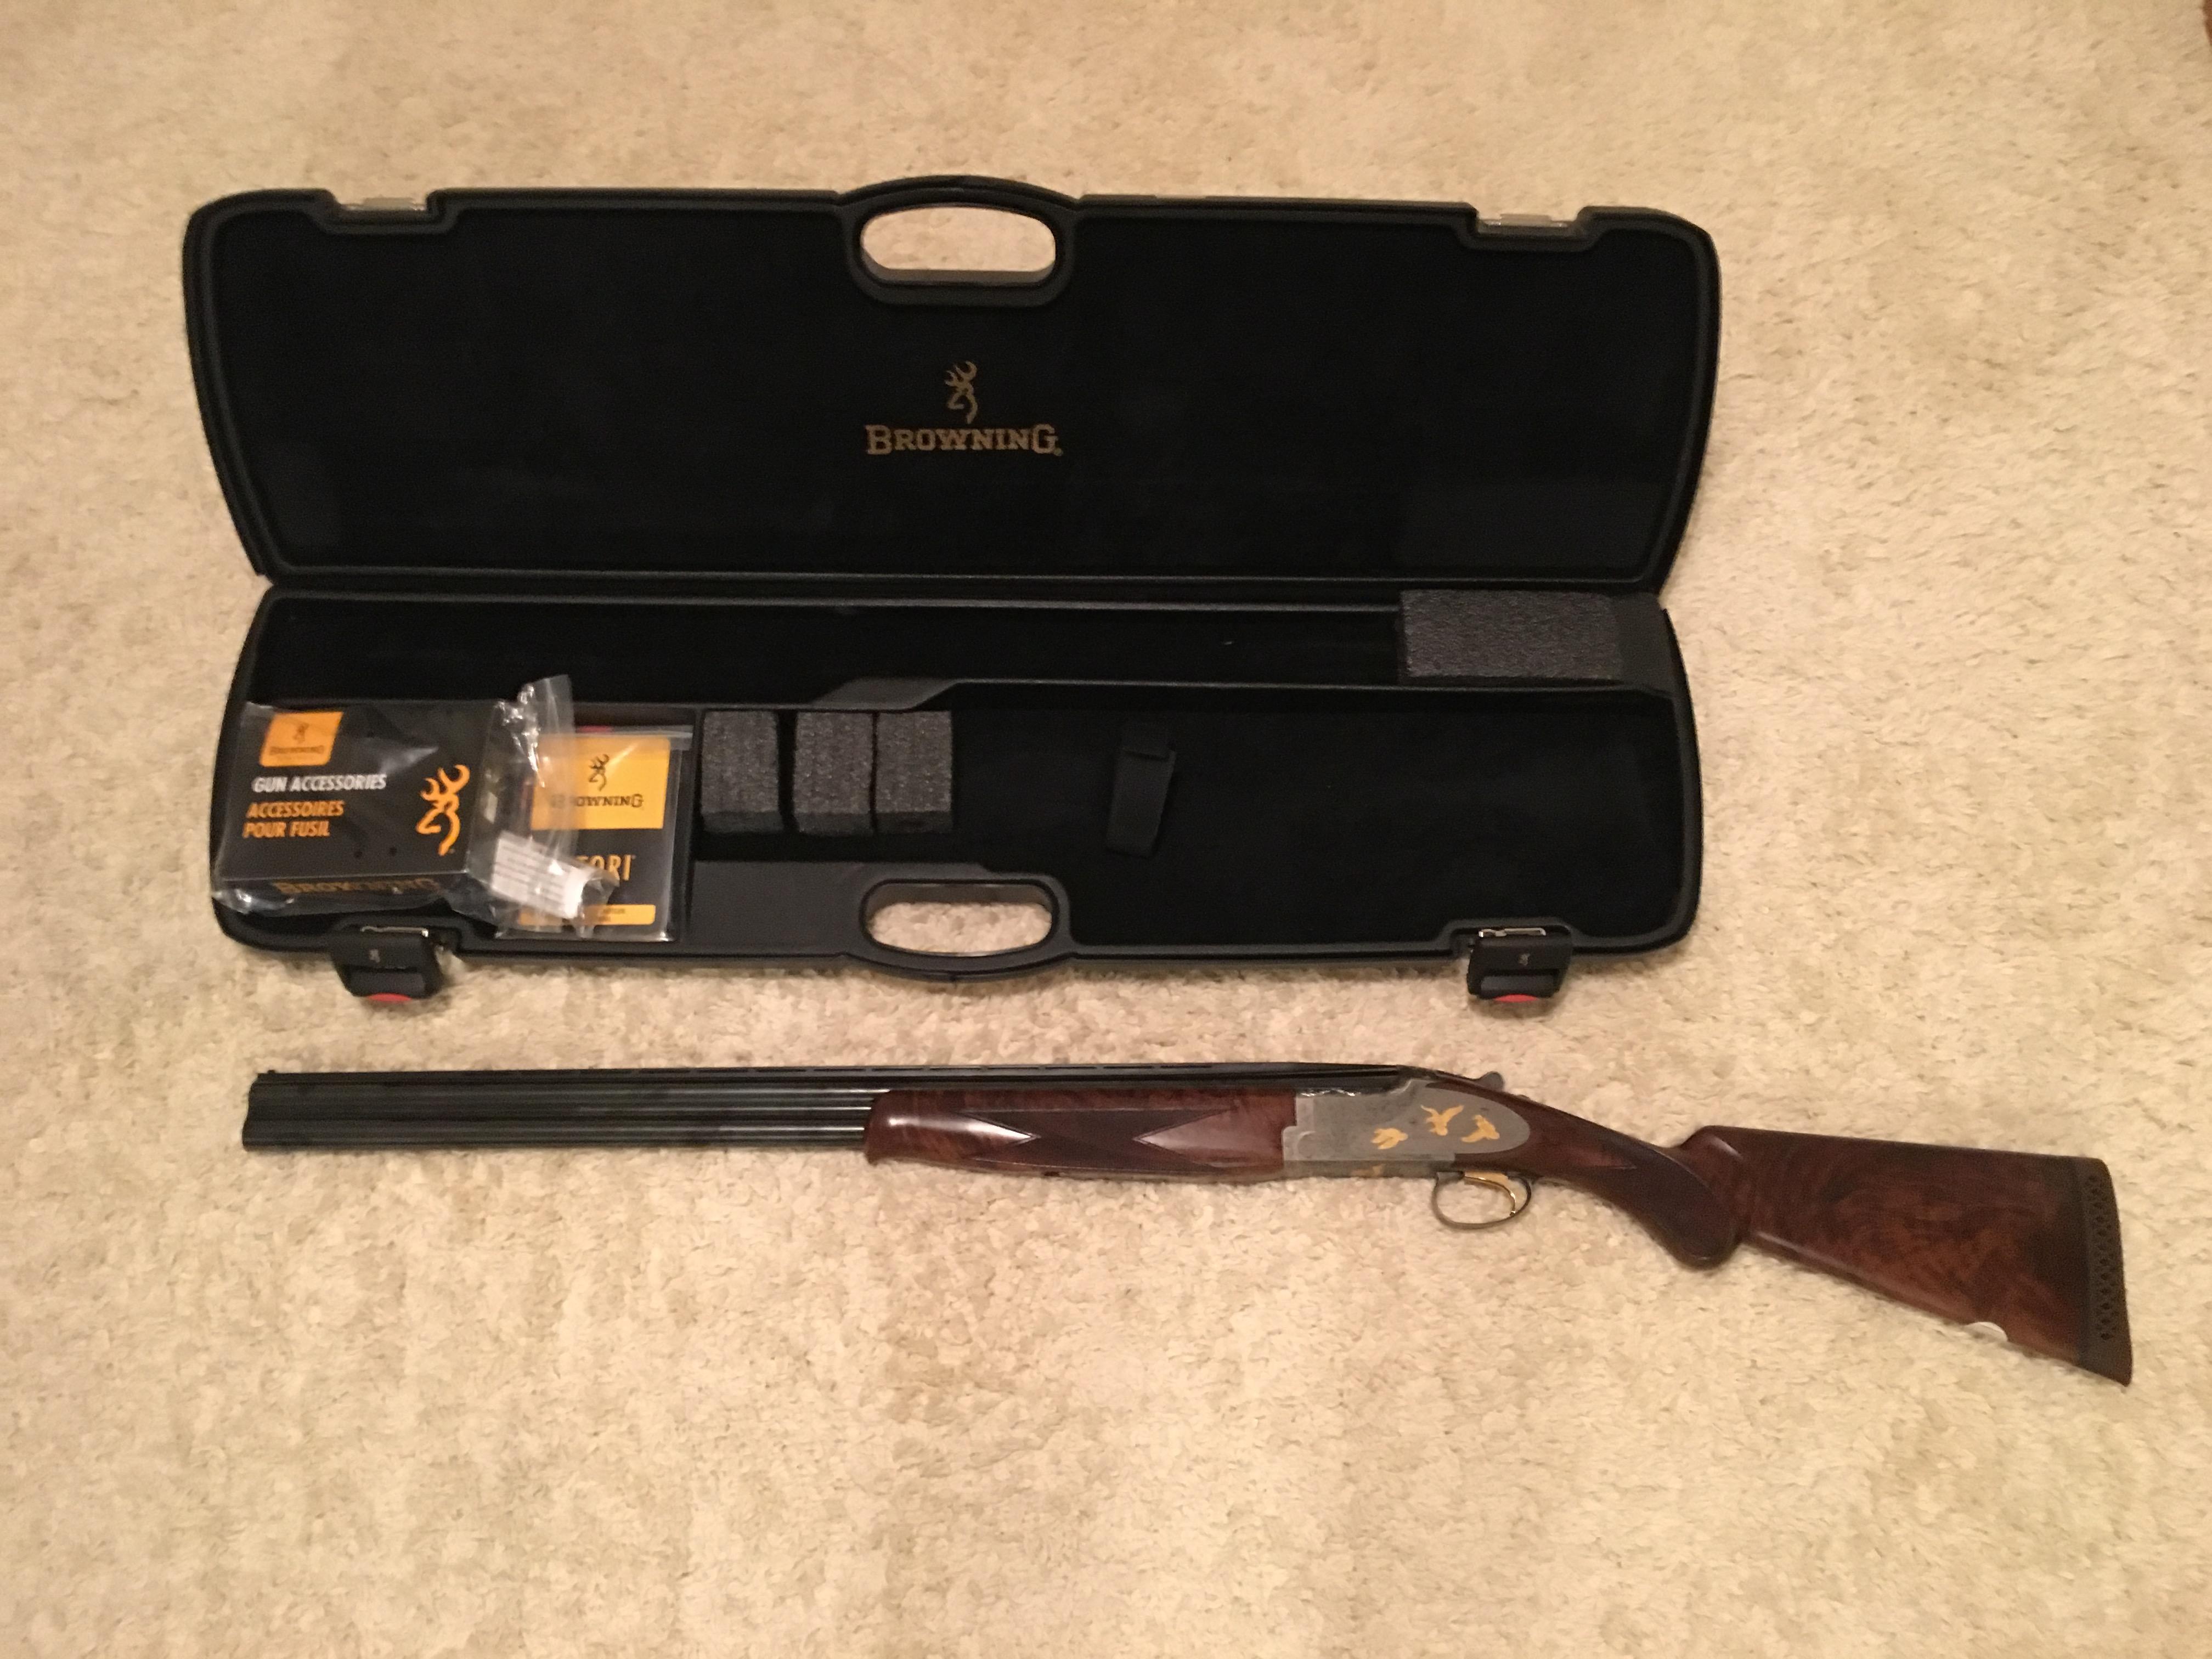 Shotgunworld com • 12 GAUGE BROWNING CITORI HERITAGE WORTH?